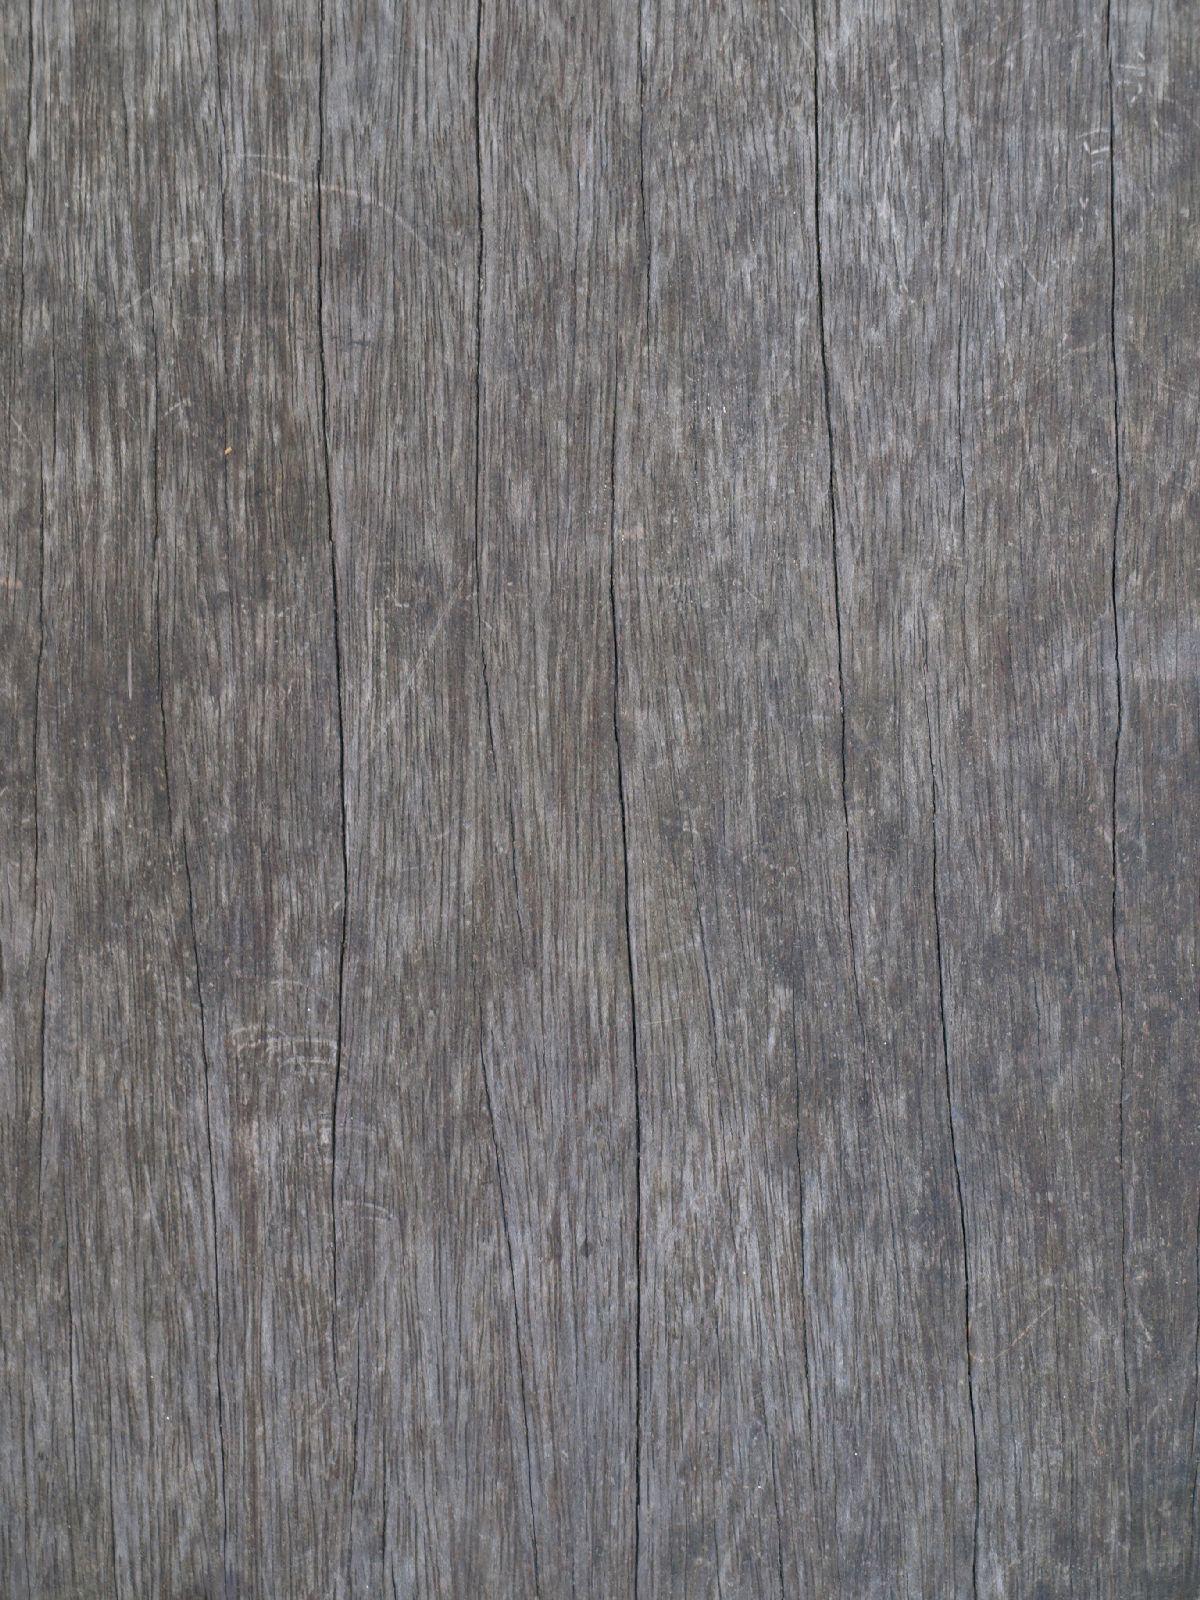 Wood_Texture_A_P6223574